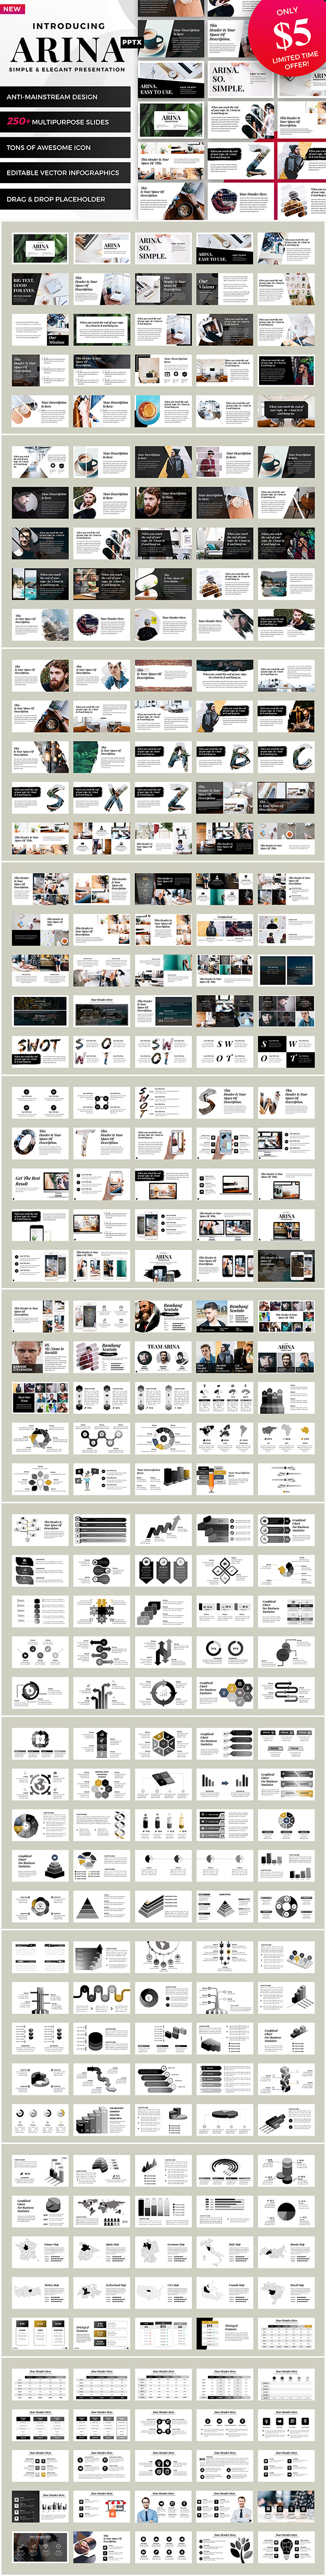 GraphicRiver Arina Powerpoint 21083771